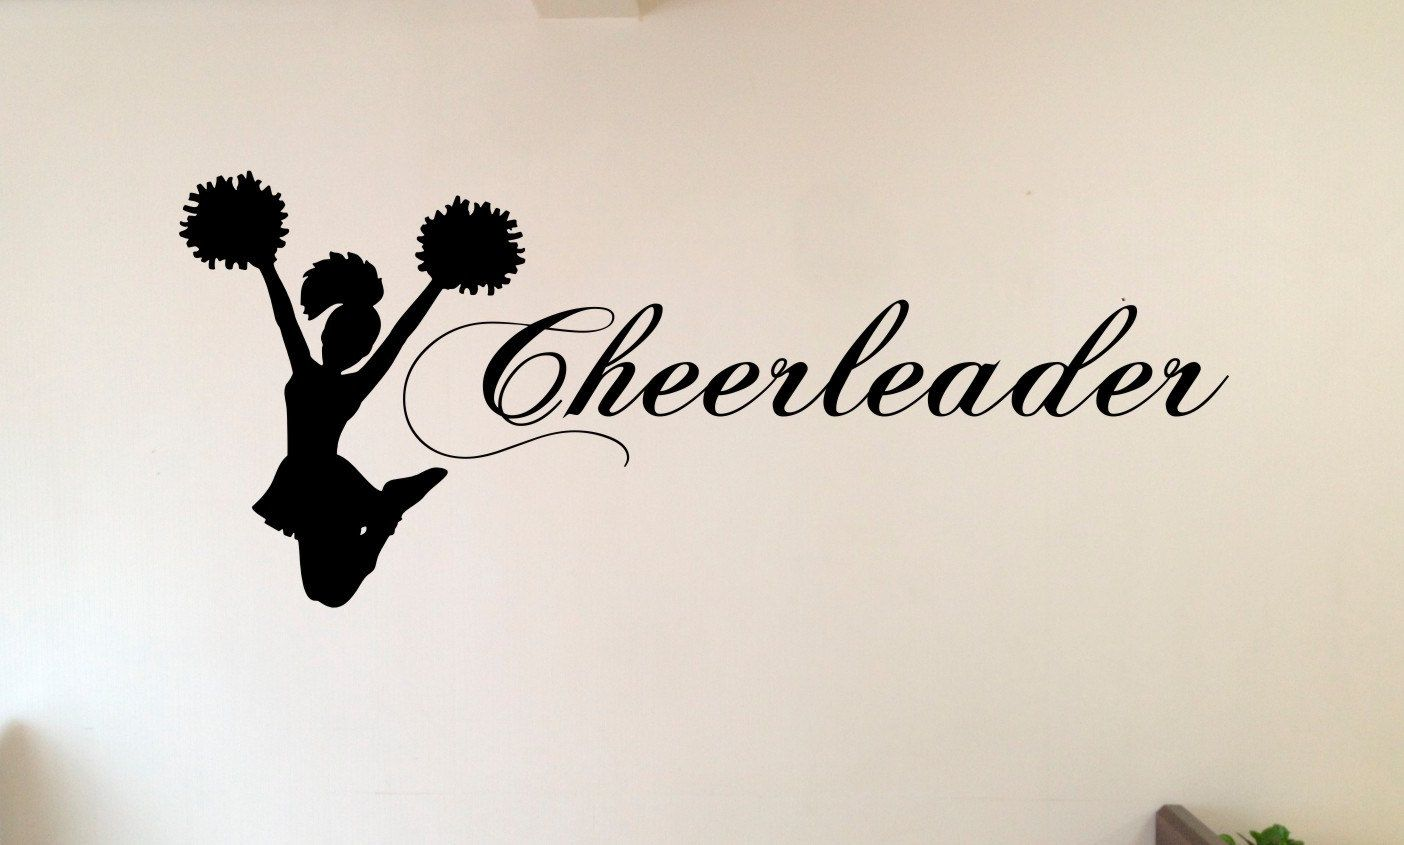 Jumping Cheerleader Vinyl Wall Decal,Wall art,Custom Wall Decal,Vinyl Wall Decal,Removable Wall Vinyl,Girls Vinyl Wall Decal,Bedroom Wall